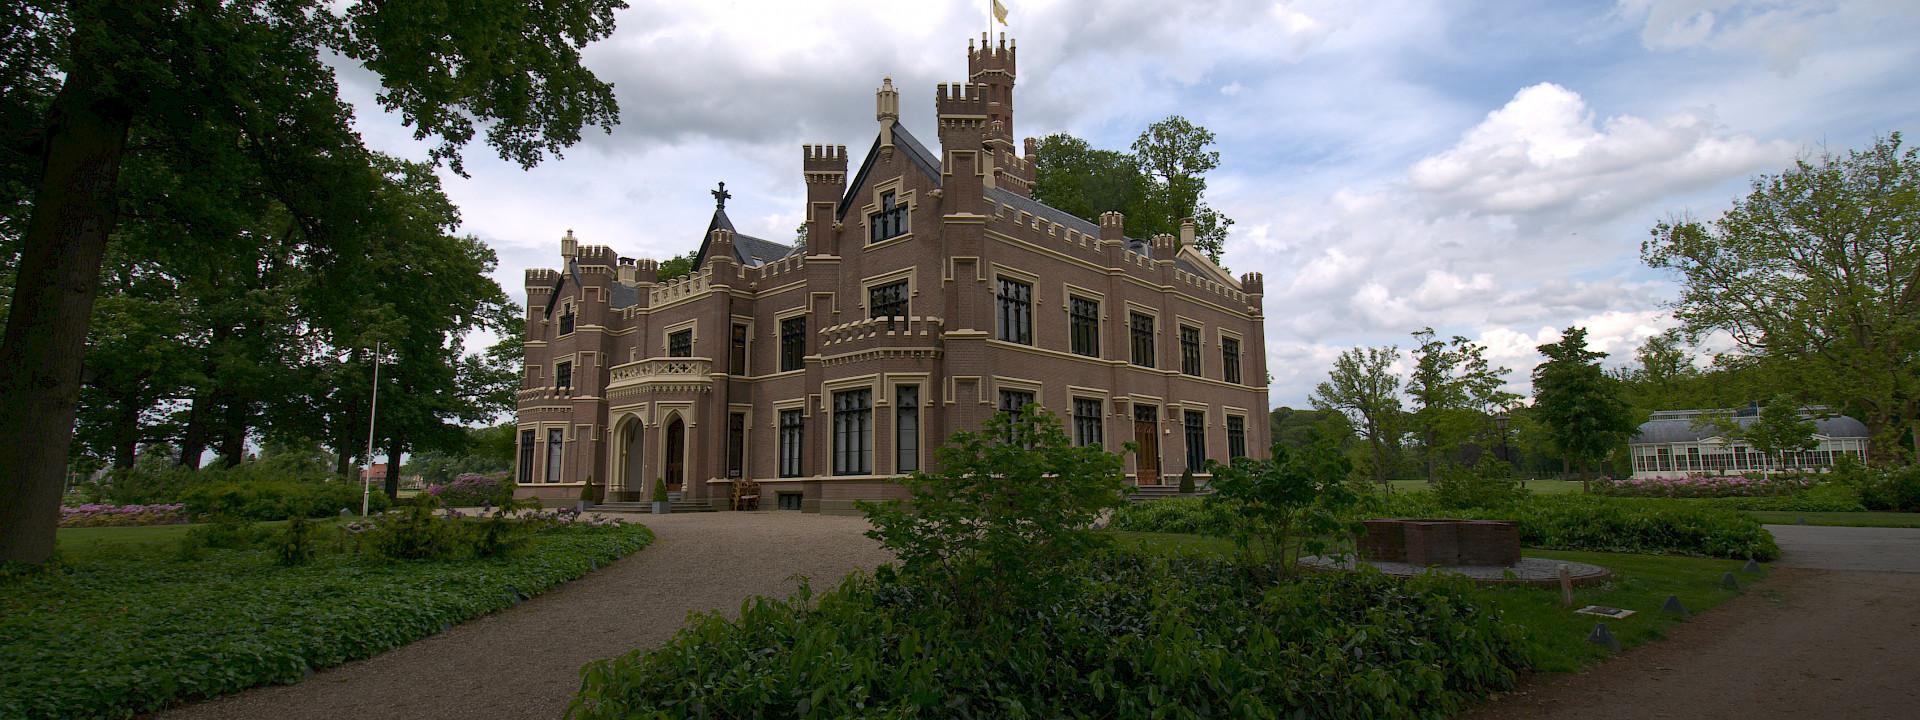 Schaffelaar Castle - Barneveld, Holland - photo by via Flickr: Ferdi's - World